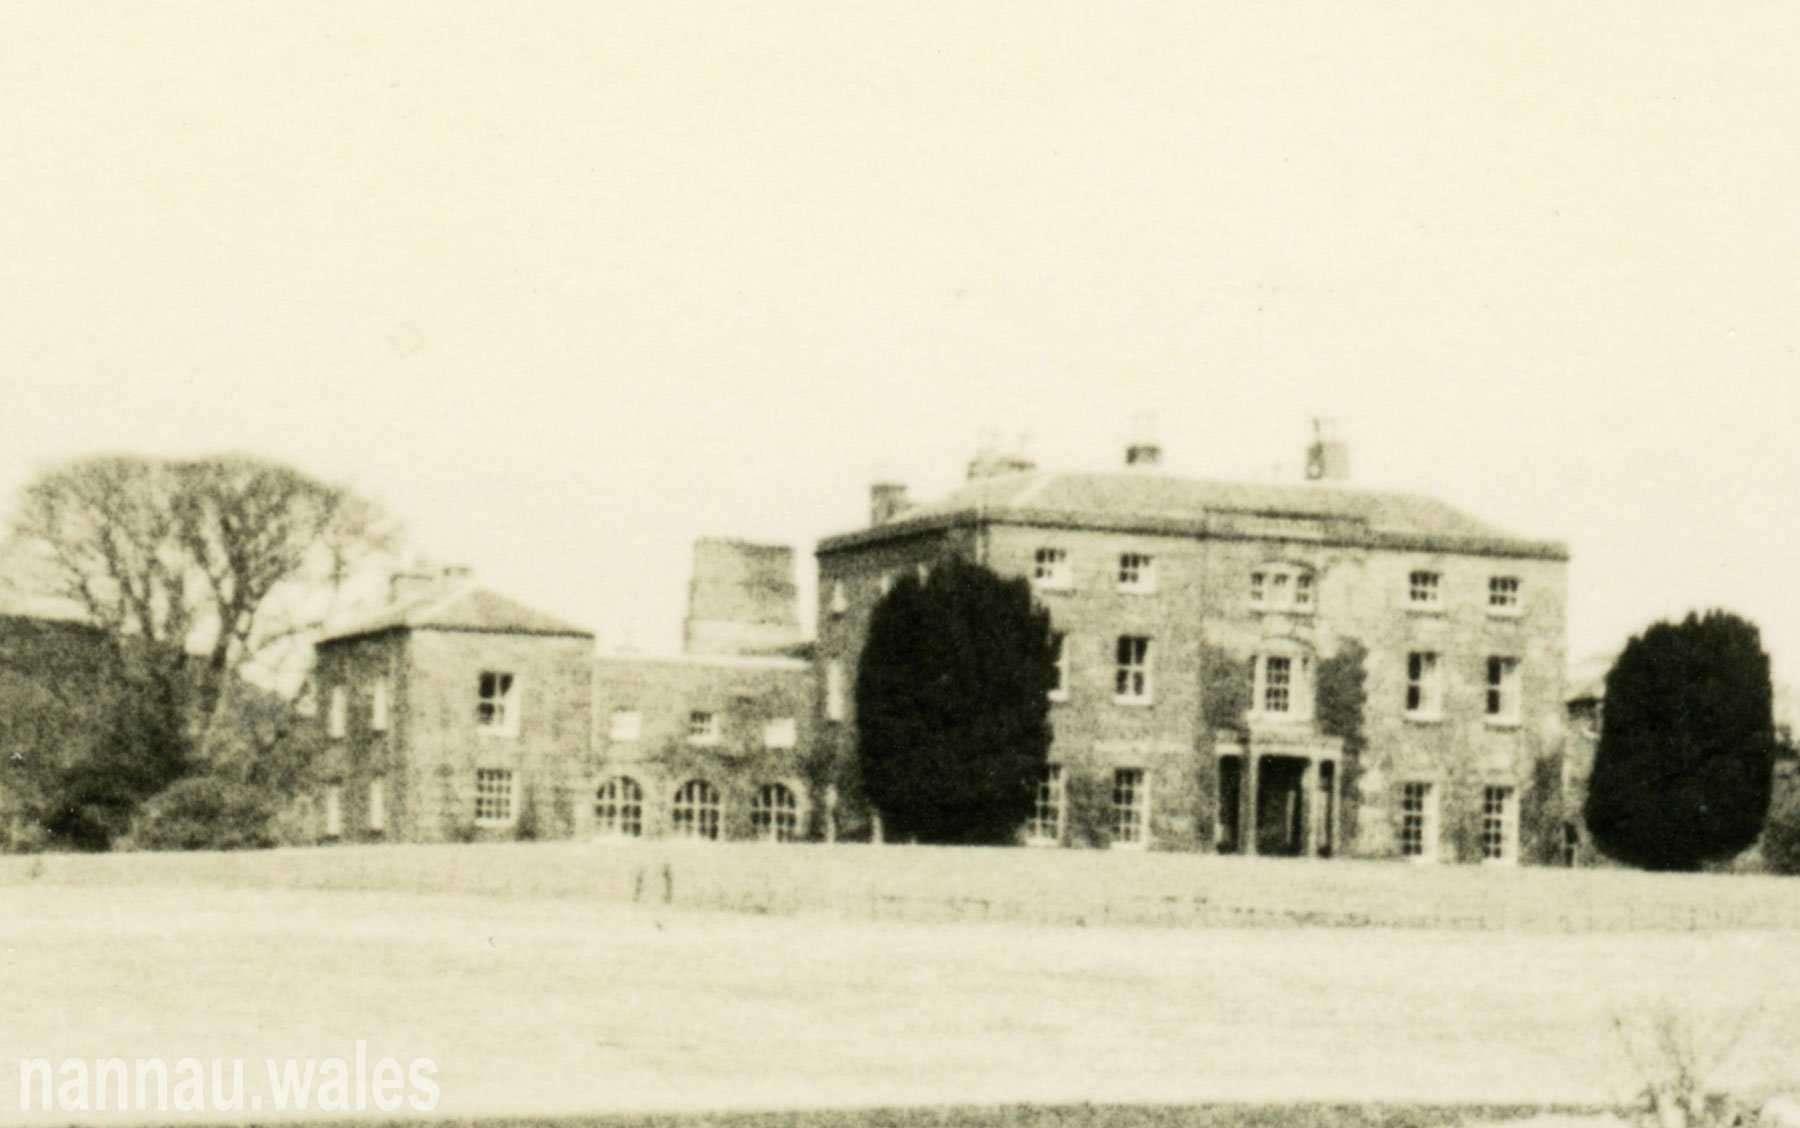 A Postcard of Plas Nannau Hall from the 1960s (Zoom)